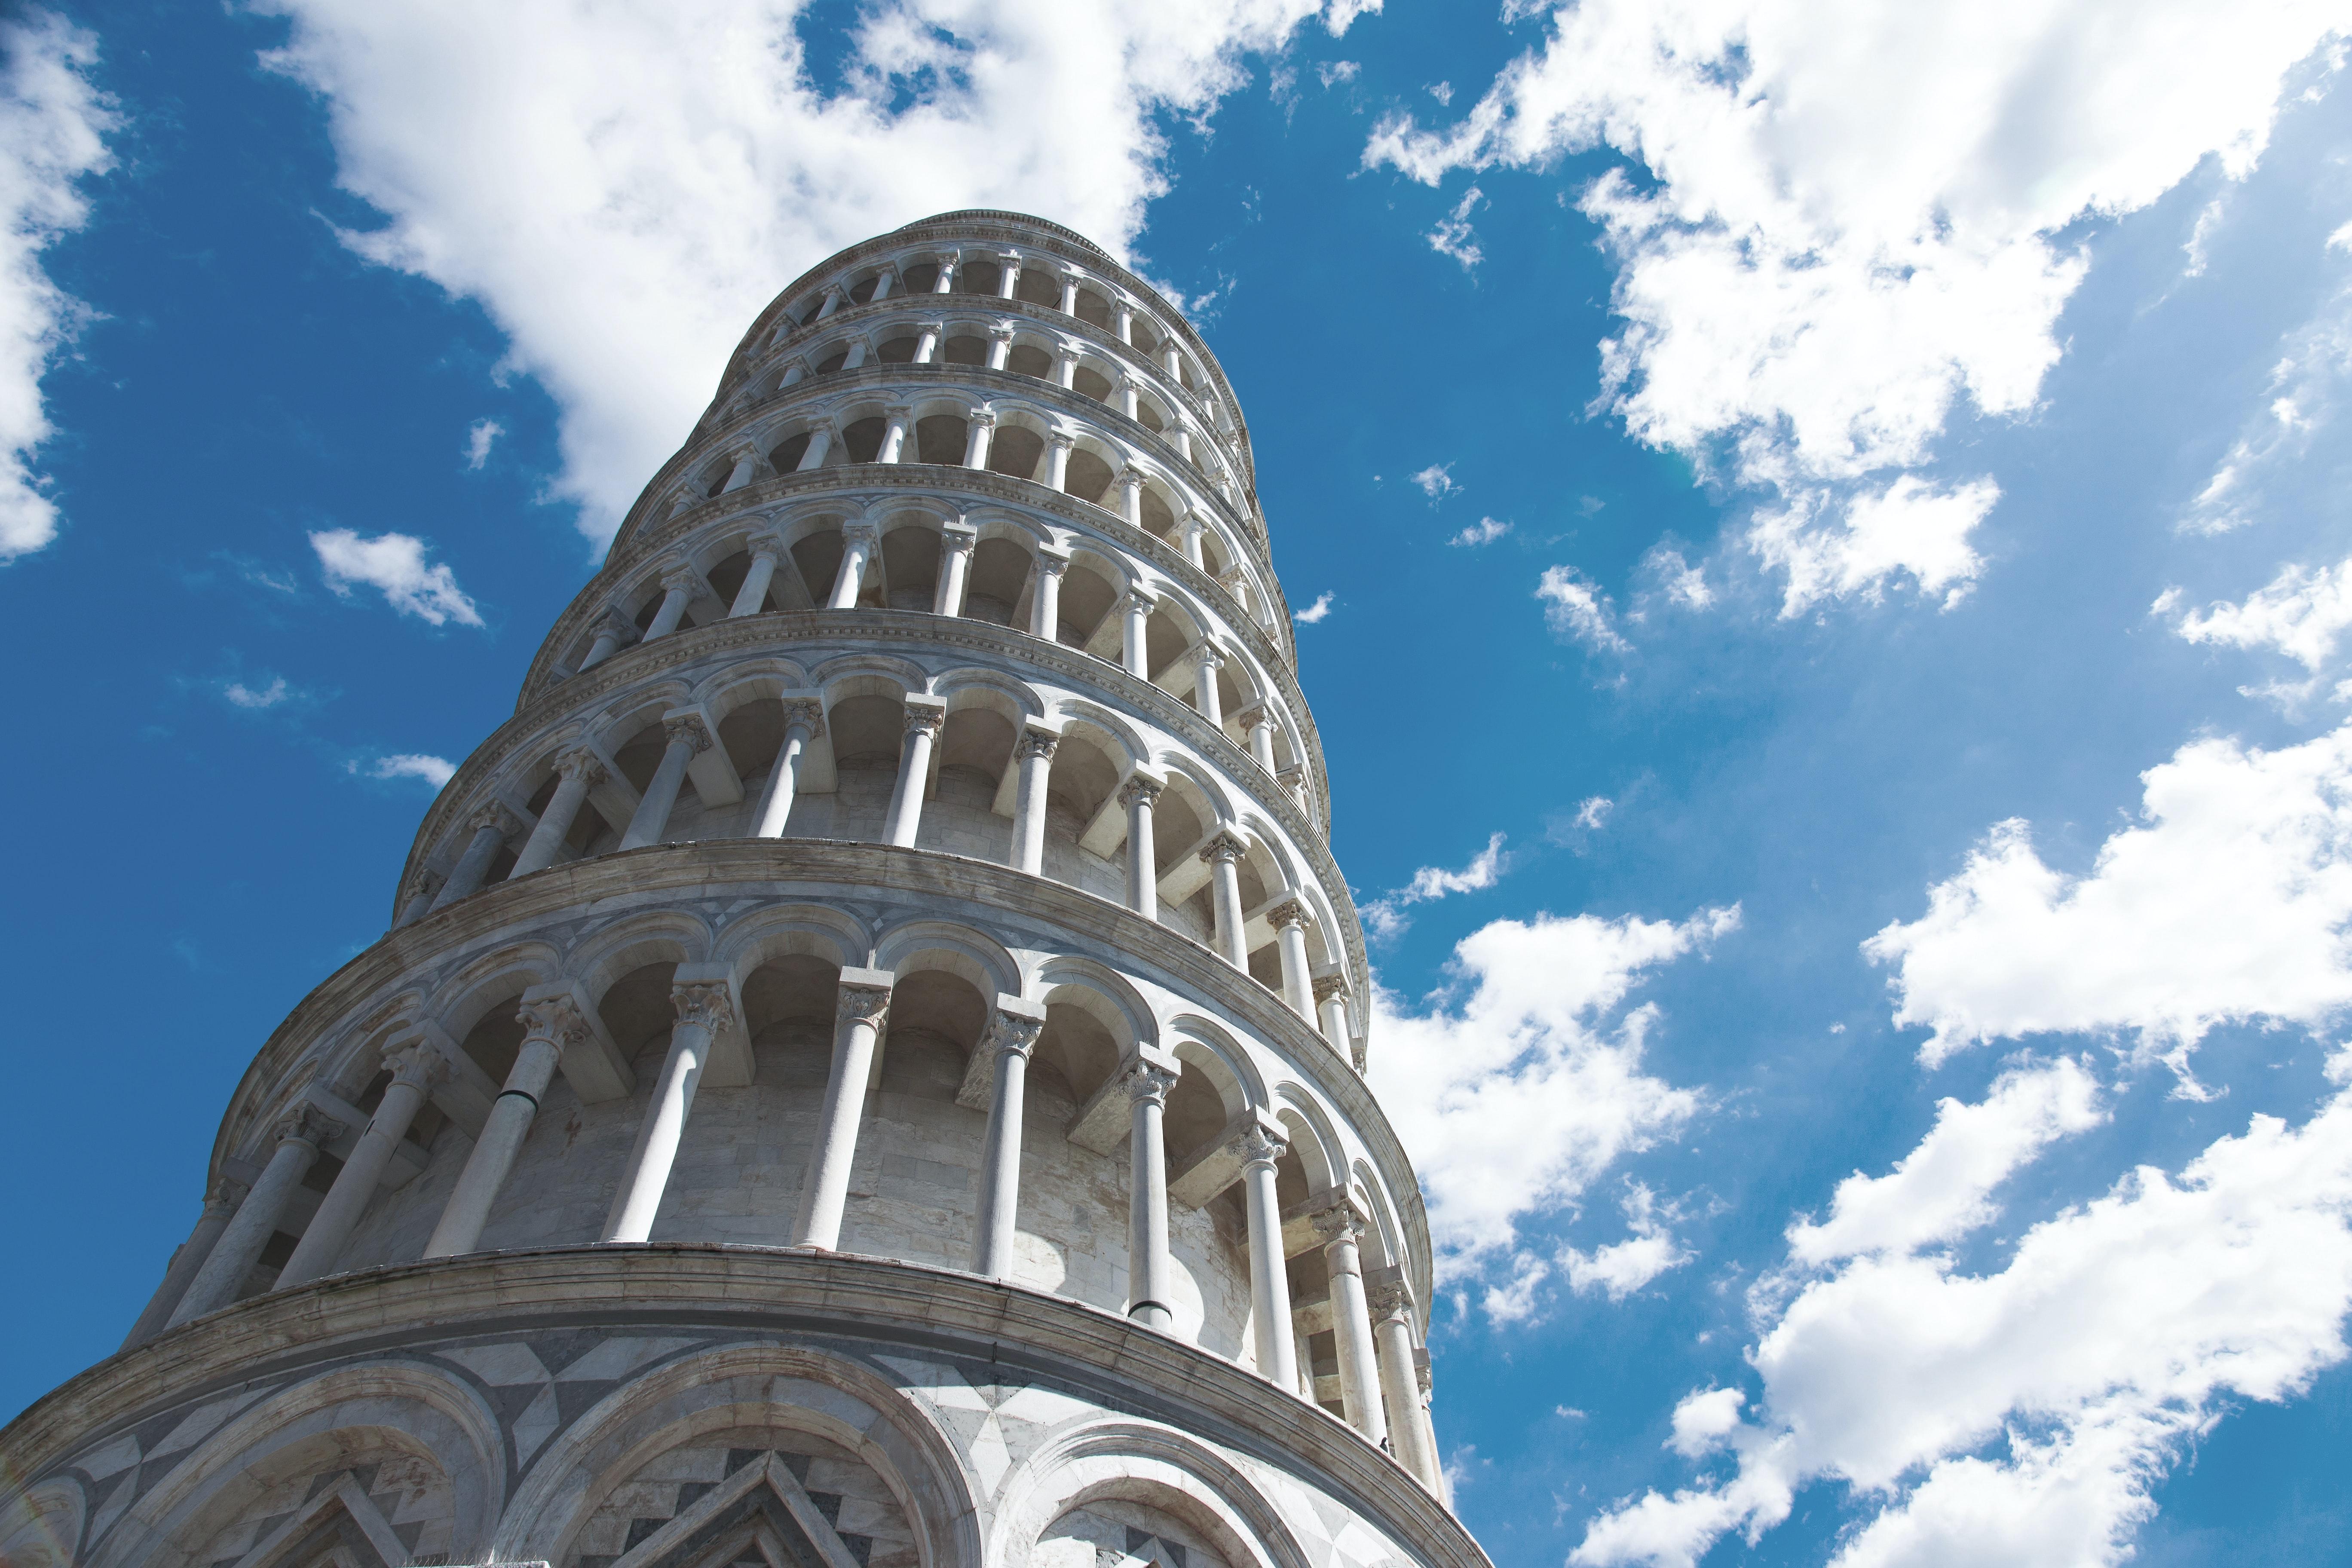 Toren van Pisa, Italië groepsreizen